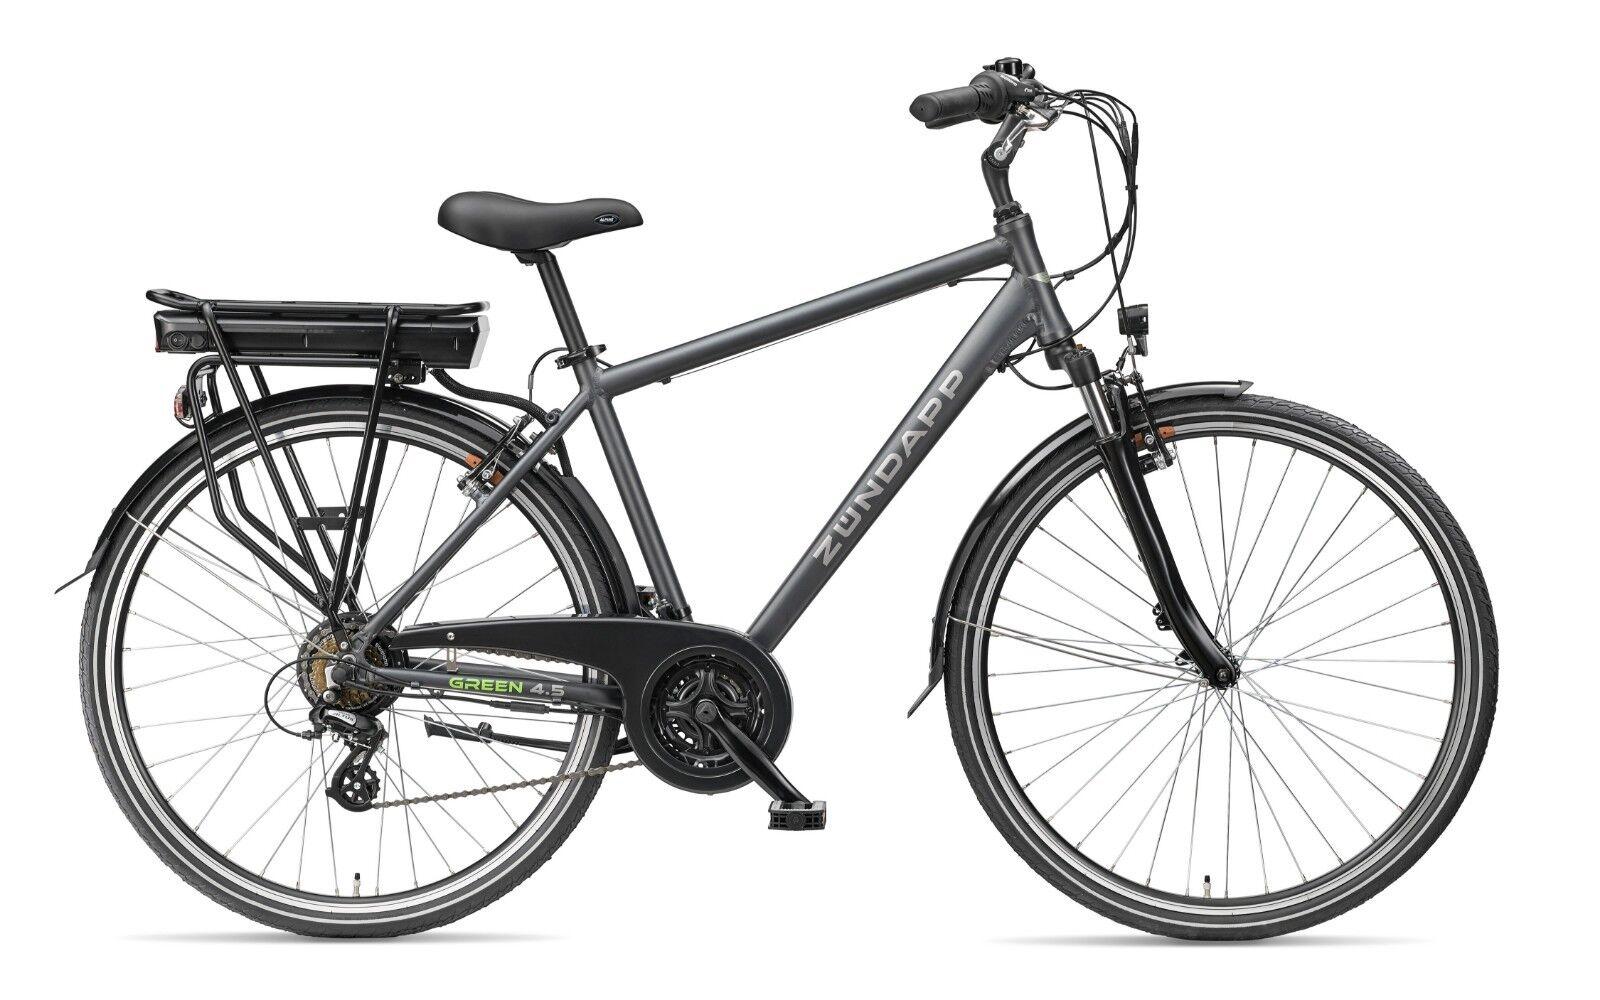 Zündapp E-Bike 28 Zoll Herren Elektrofahrrad 21-Gang Trekking Pedelec Green 4.5